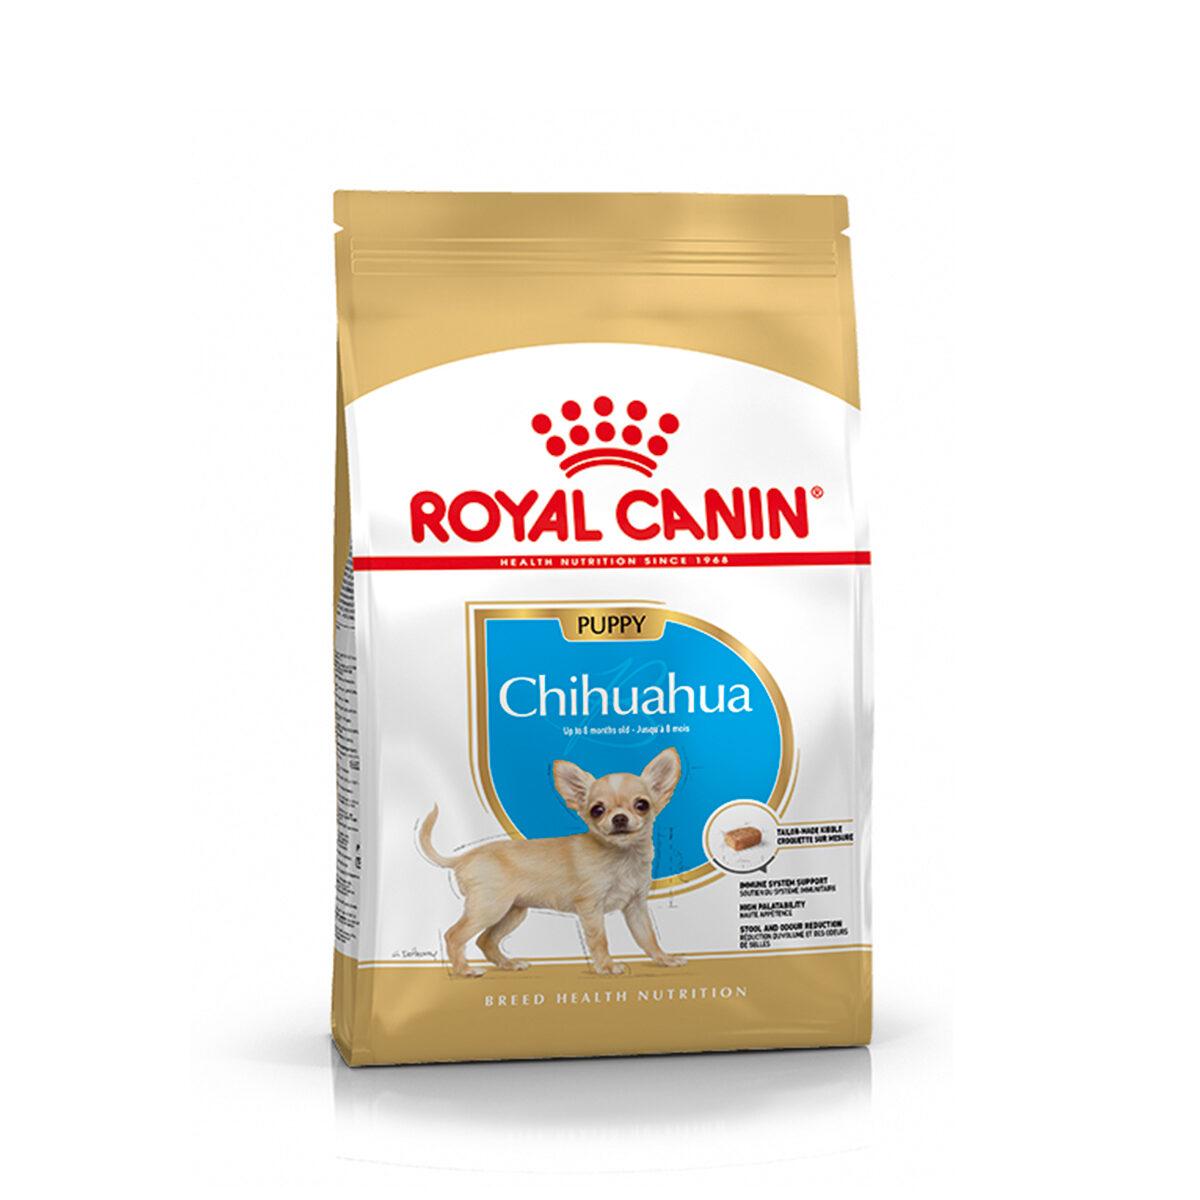 Royal Canin Chihuahua Puppy Hondenvoer 1,5 kg